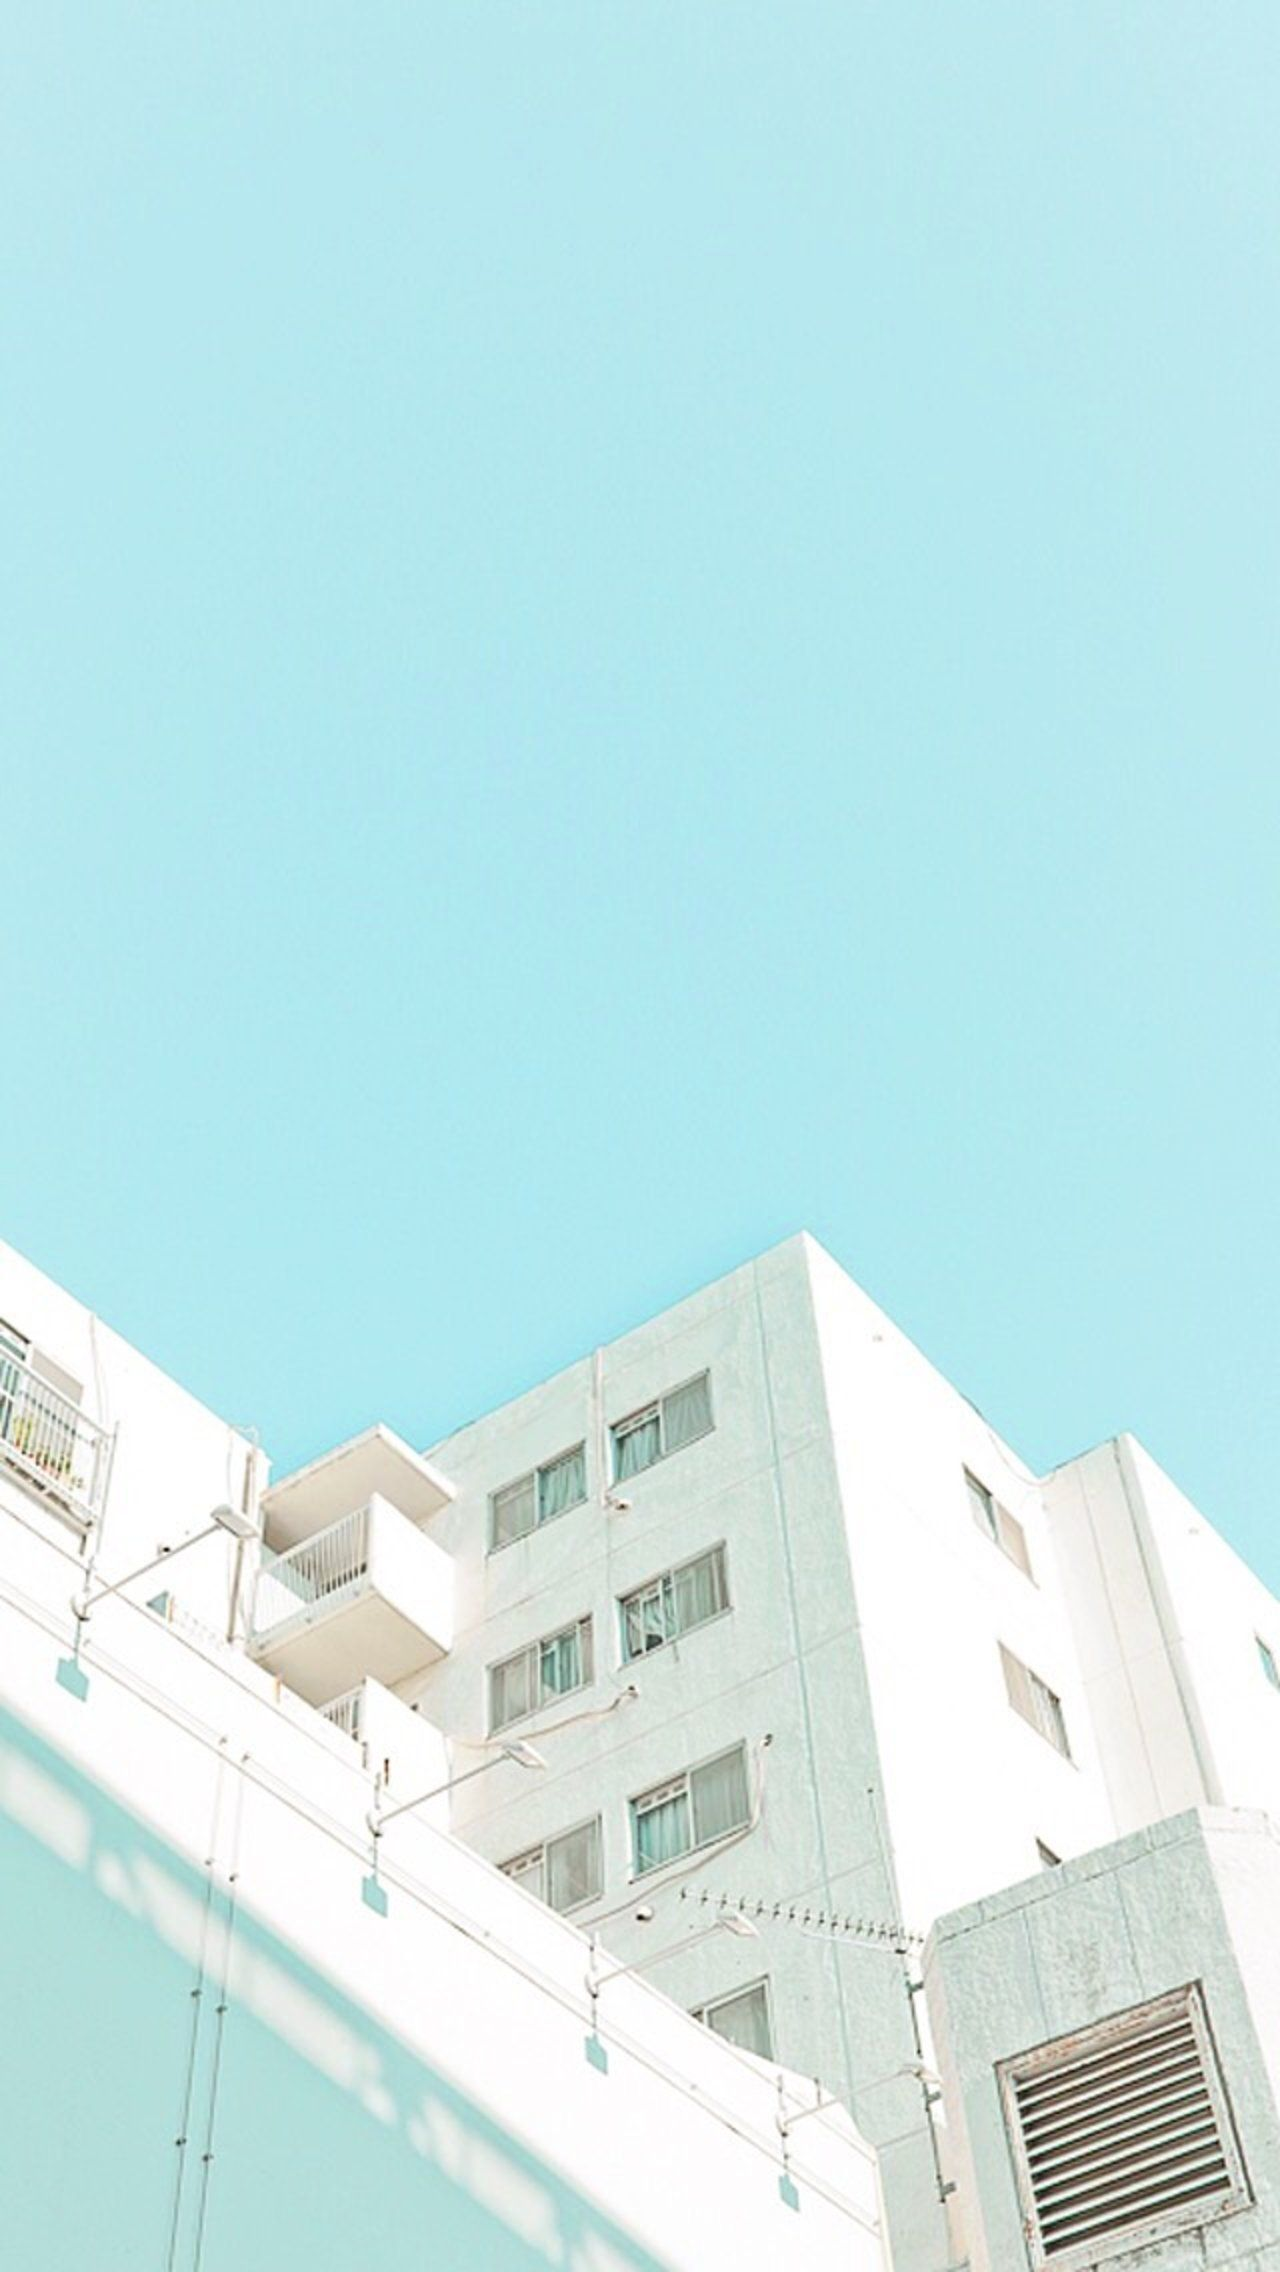 Pastel Aesthetic Wallpaper Blue